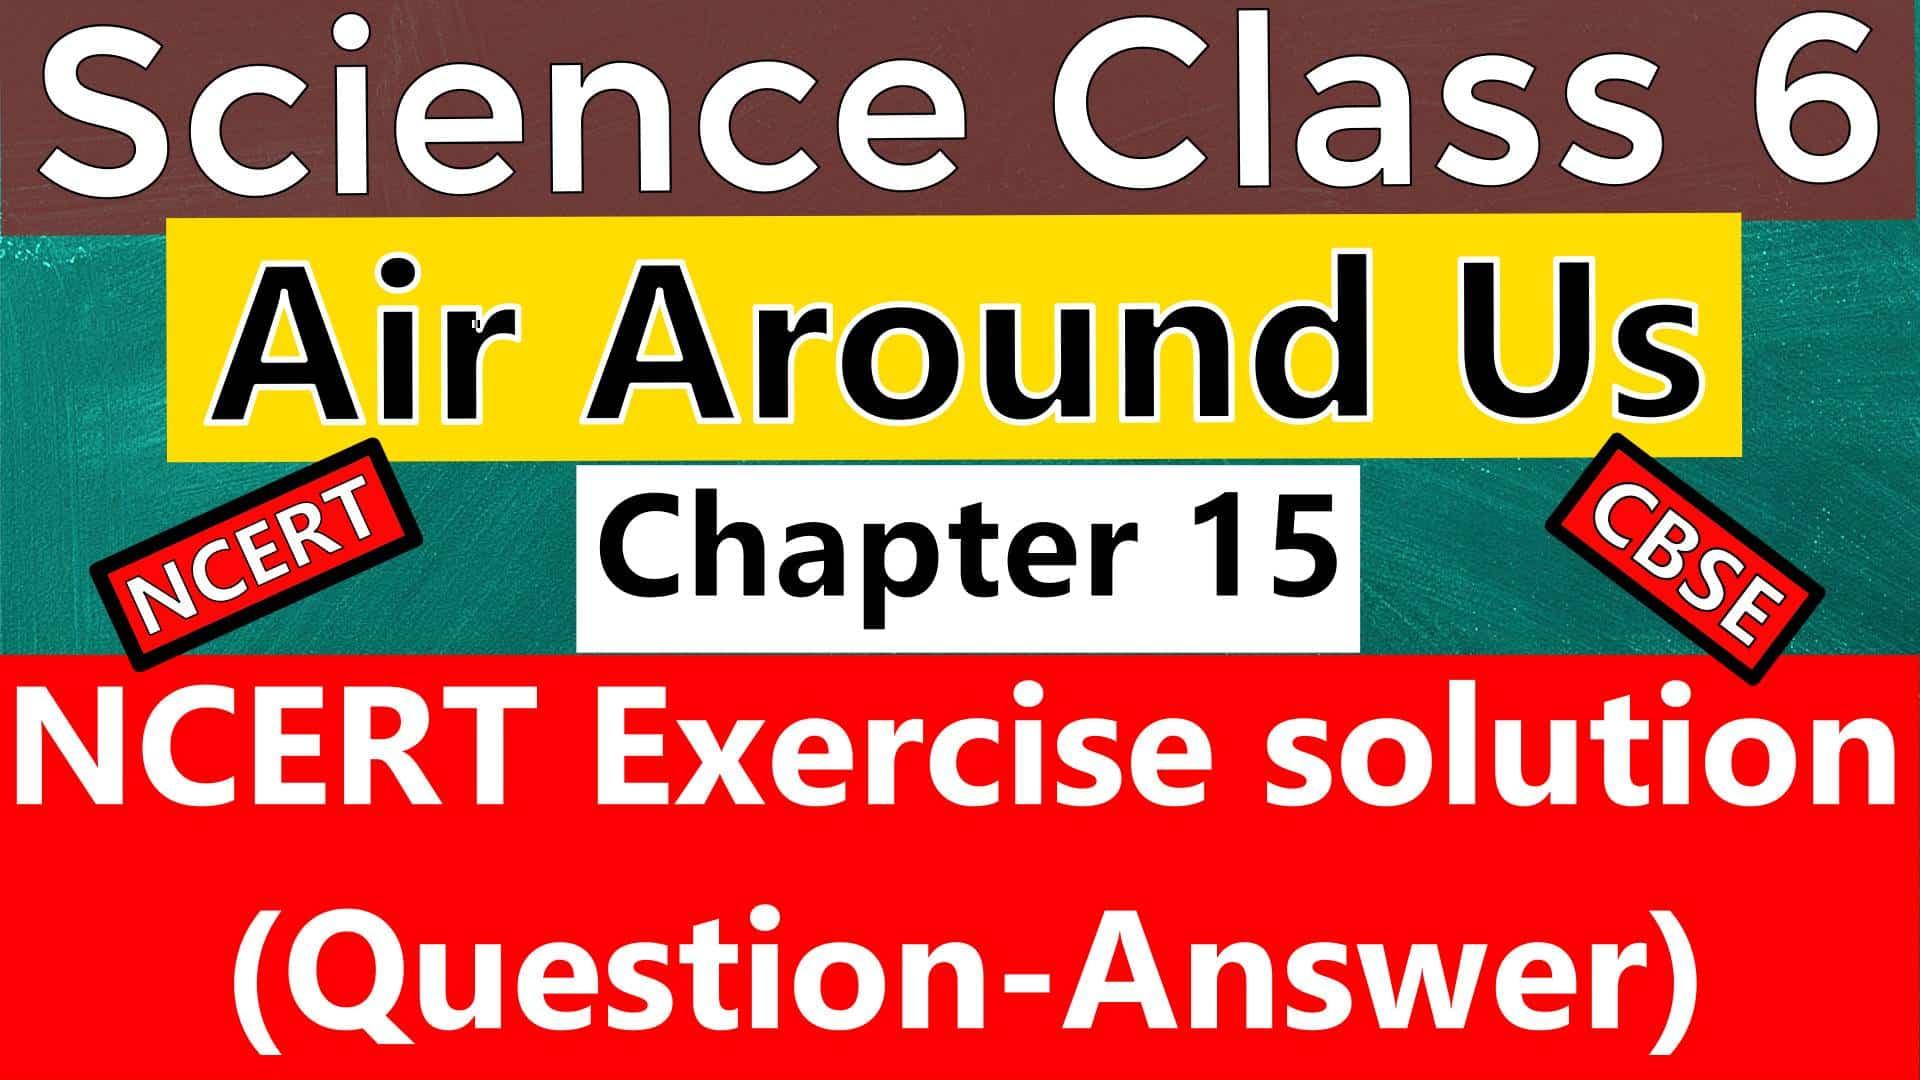 Cbse Science Class 6 Chapter 15 Air Around Us Ncert